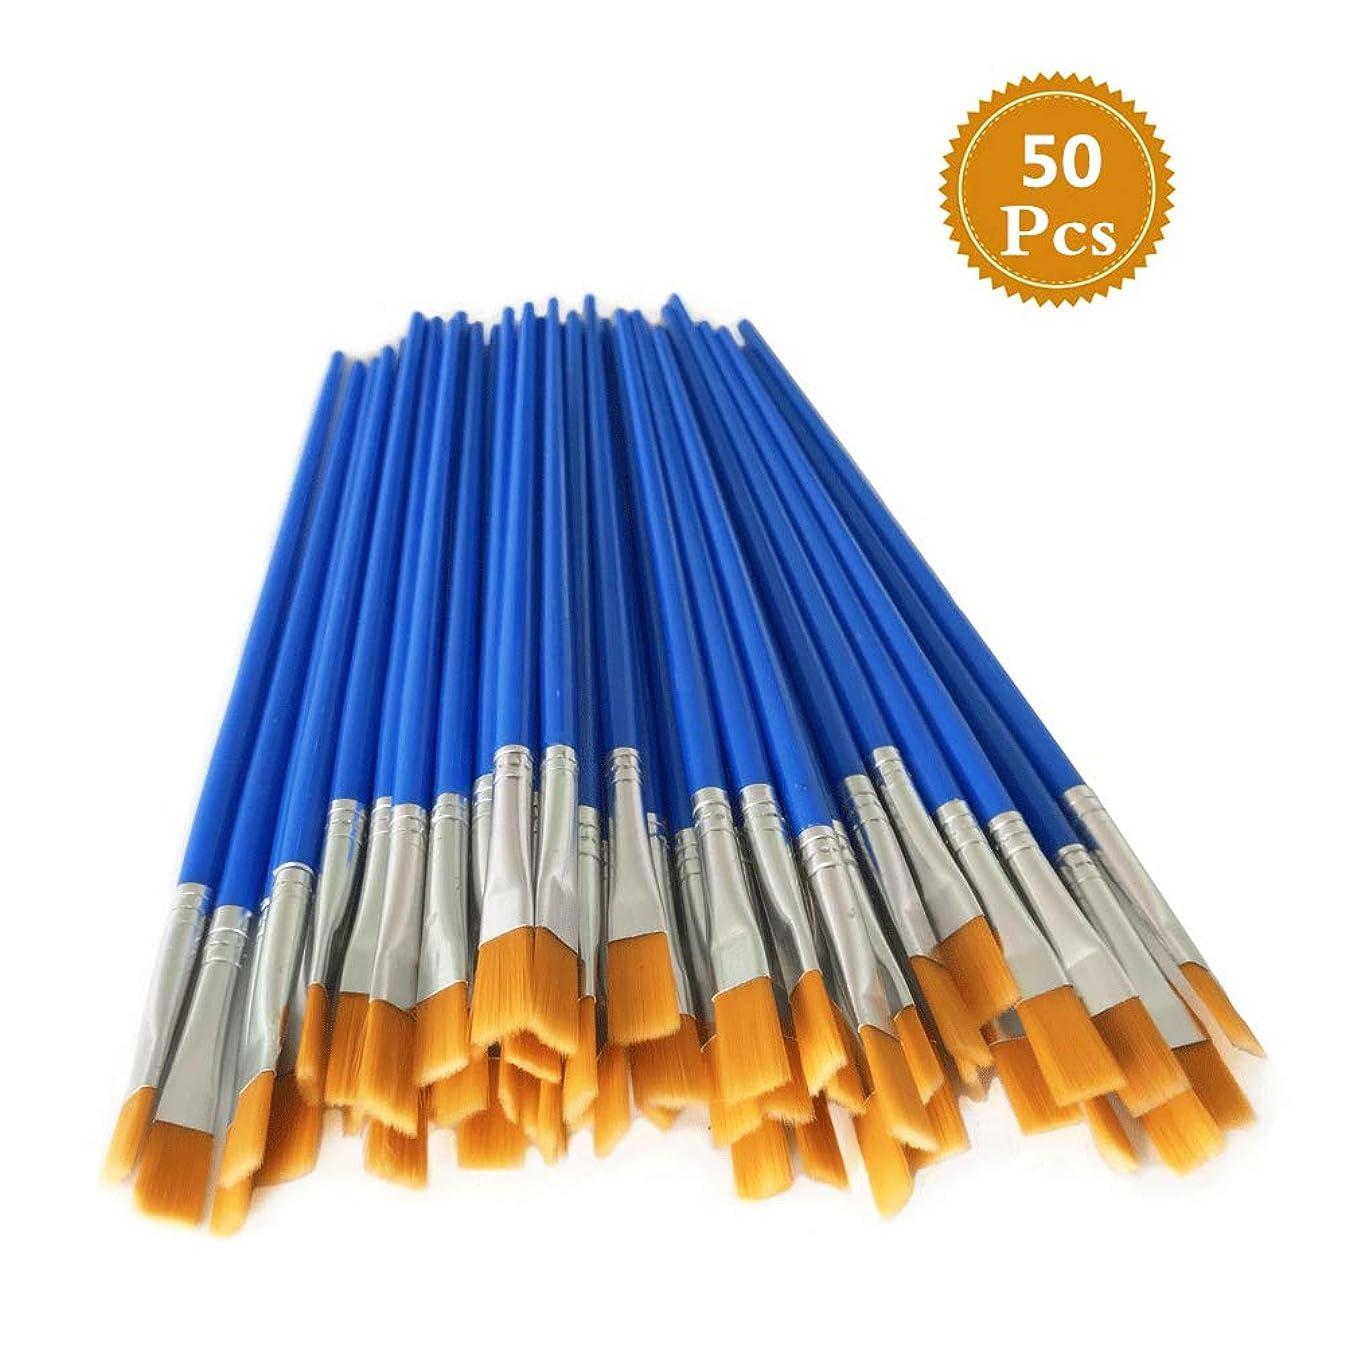 Paint Brushes Set 50 Pcs Kids Nylon Flat Hair Acrylic Small Oil Watercolor Artist Painting Kits Bulk for Children